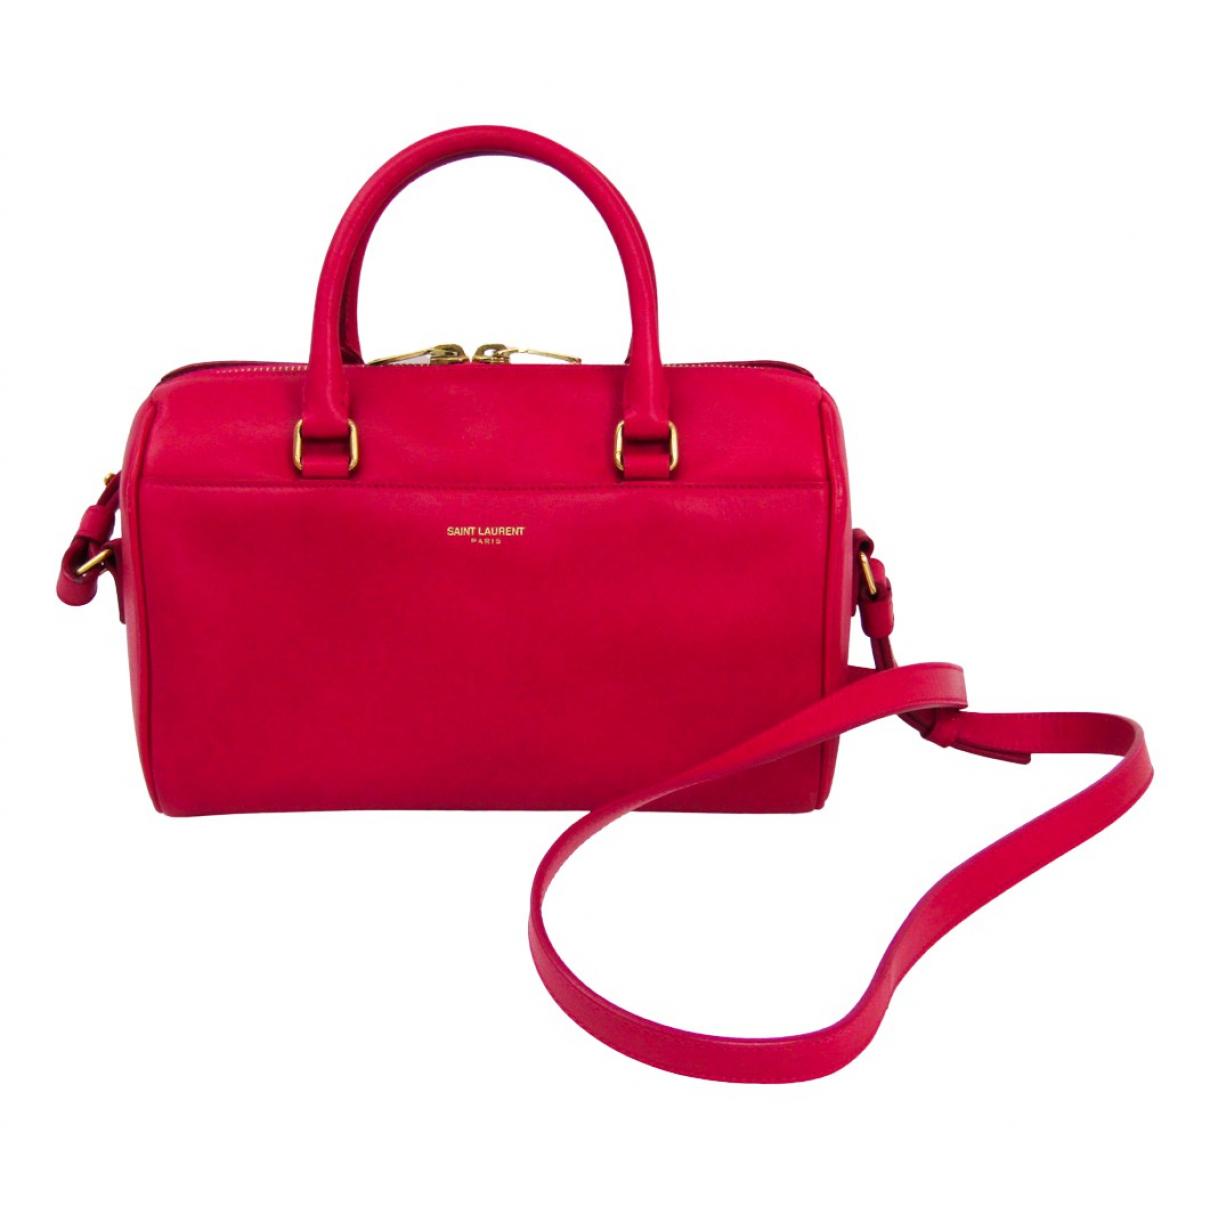 Saint Laurent Duffle Pink Leather handbag for Women \N